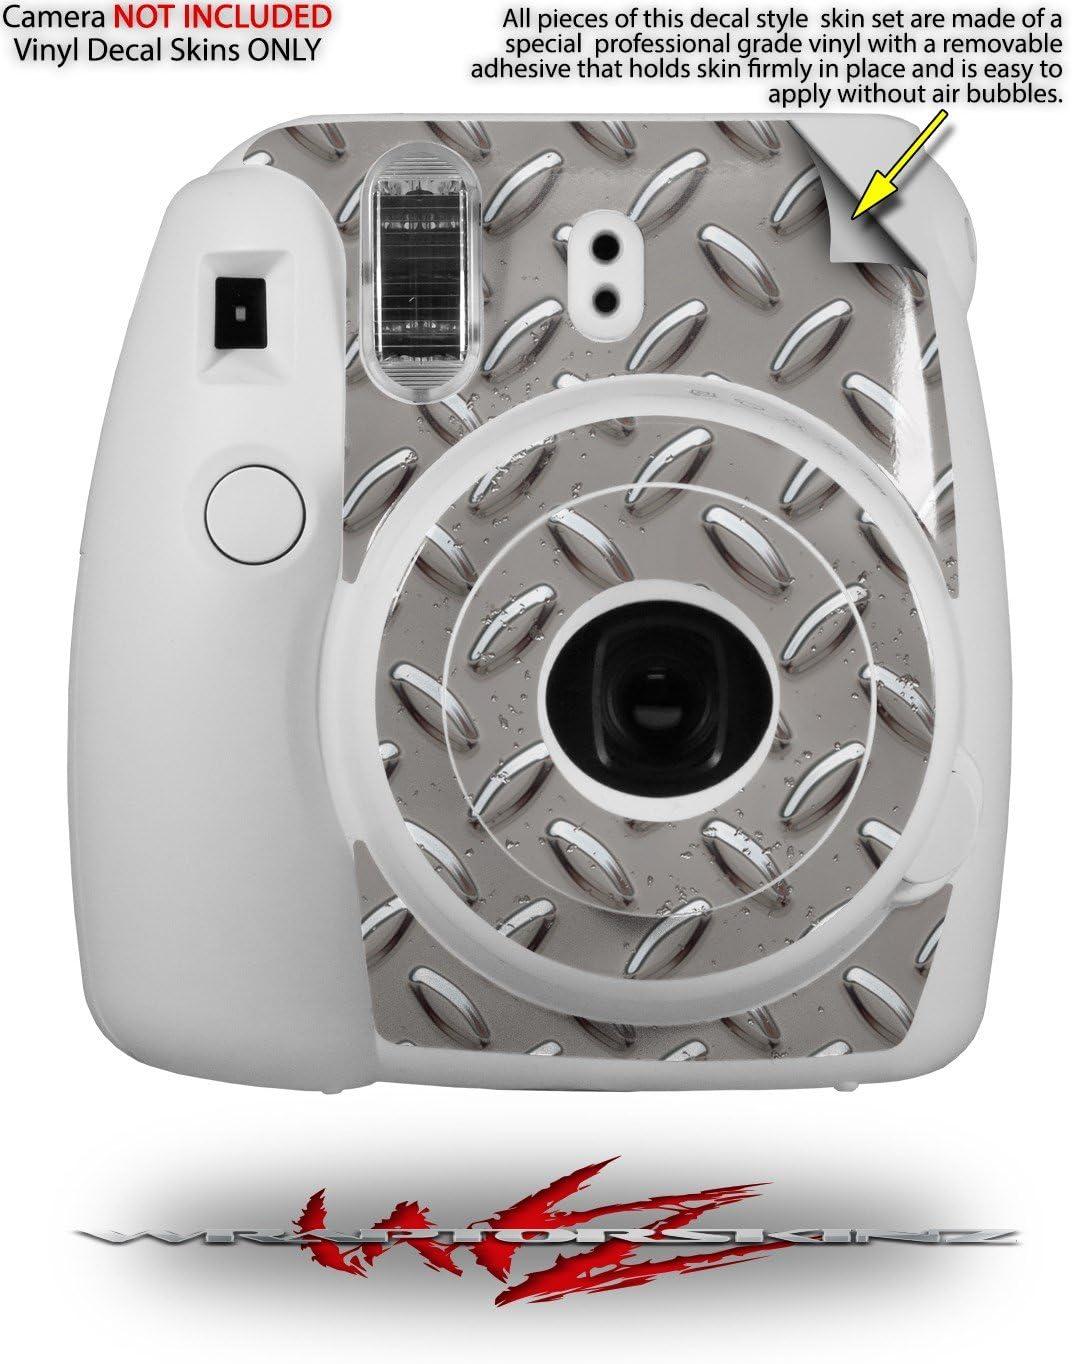 CAMERA NOT INCLUDED WraptorSkinz Skin Decal Wrap for Fujifilm Instax Mini 8 Camera Diamond Plate Metal 02